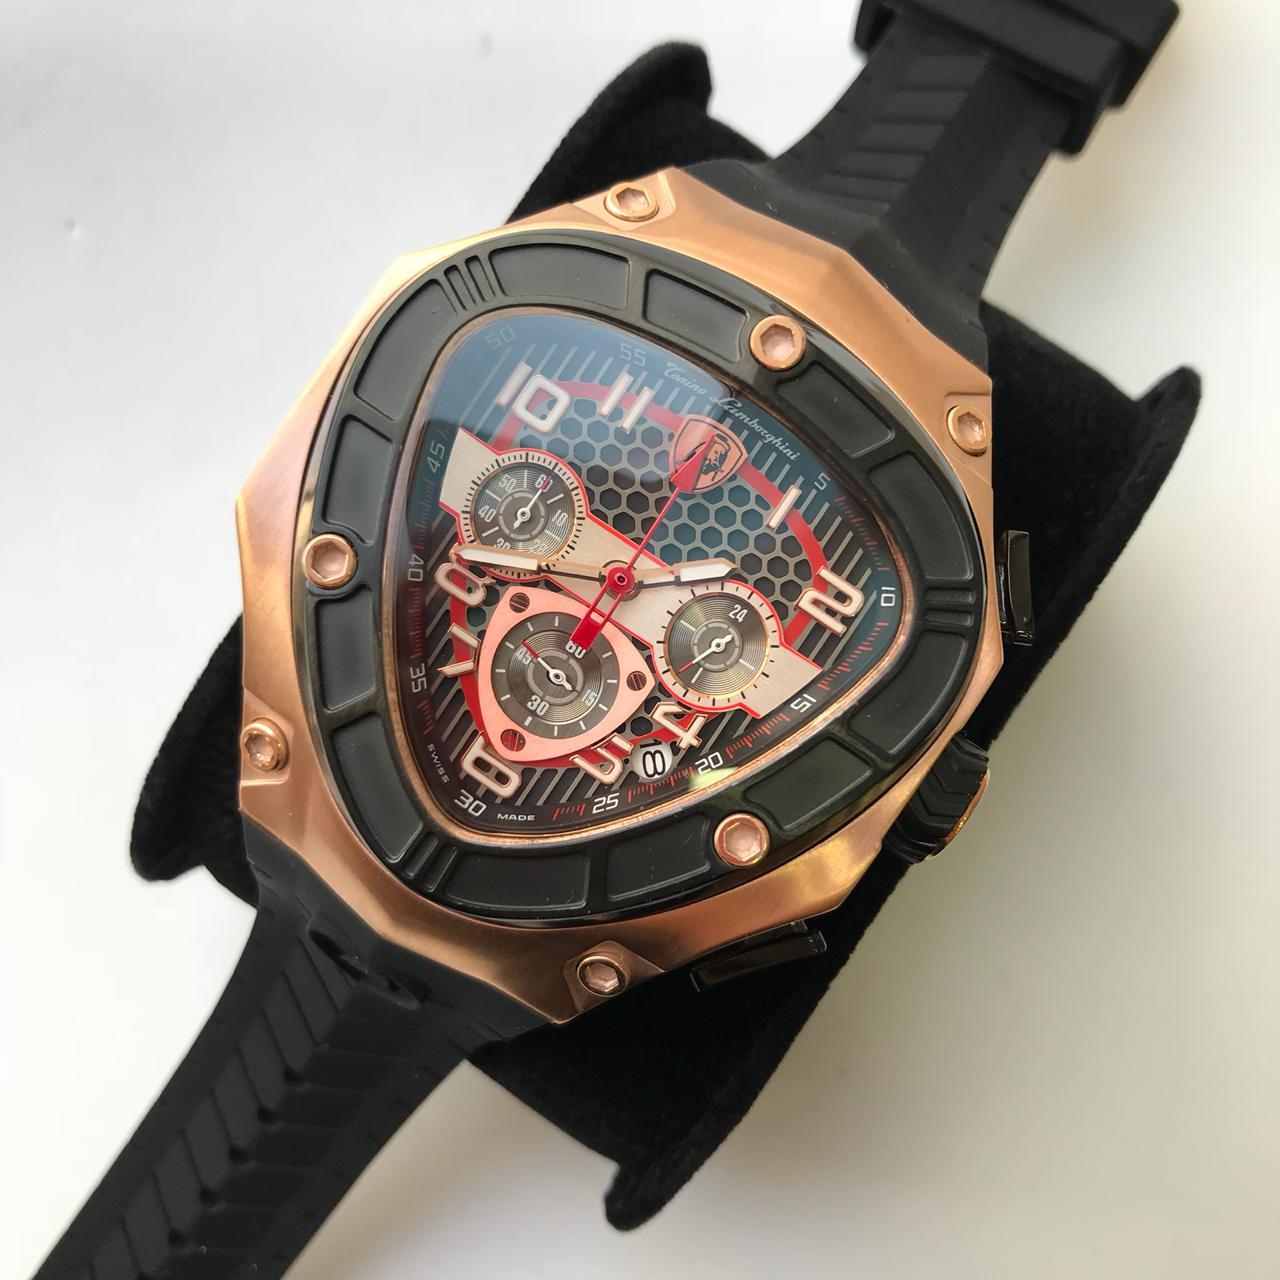 9971ed1d152 Réplica de Relógio Lamborghini – L 03 Canino – Réplicas de Relógios